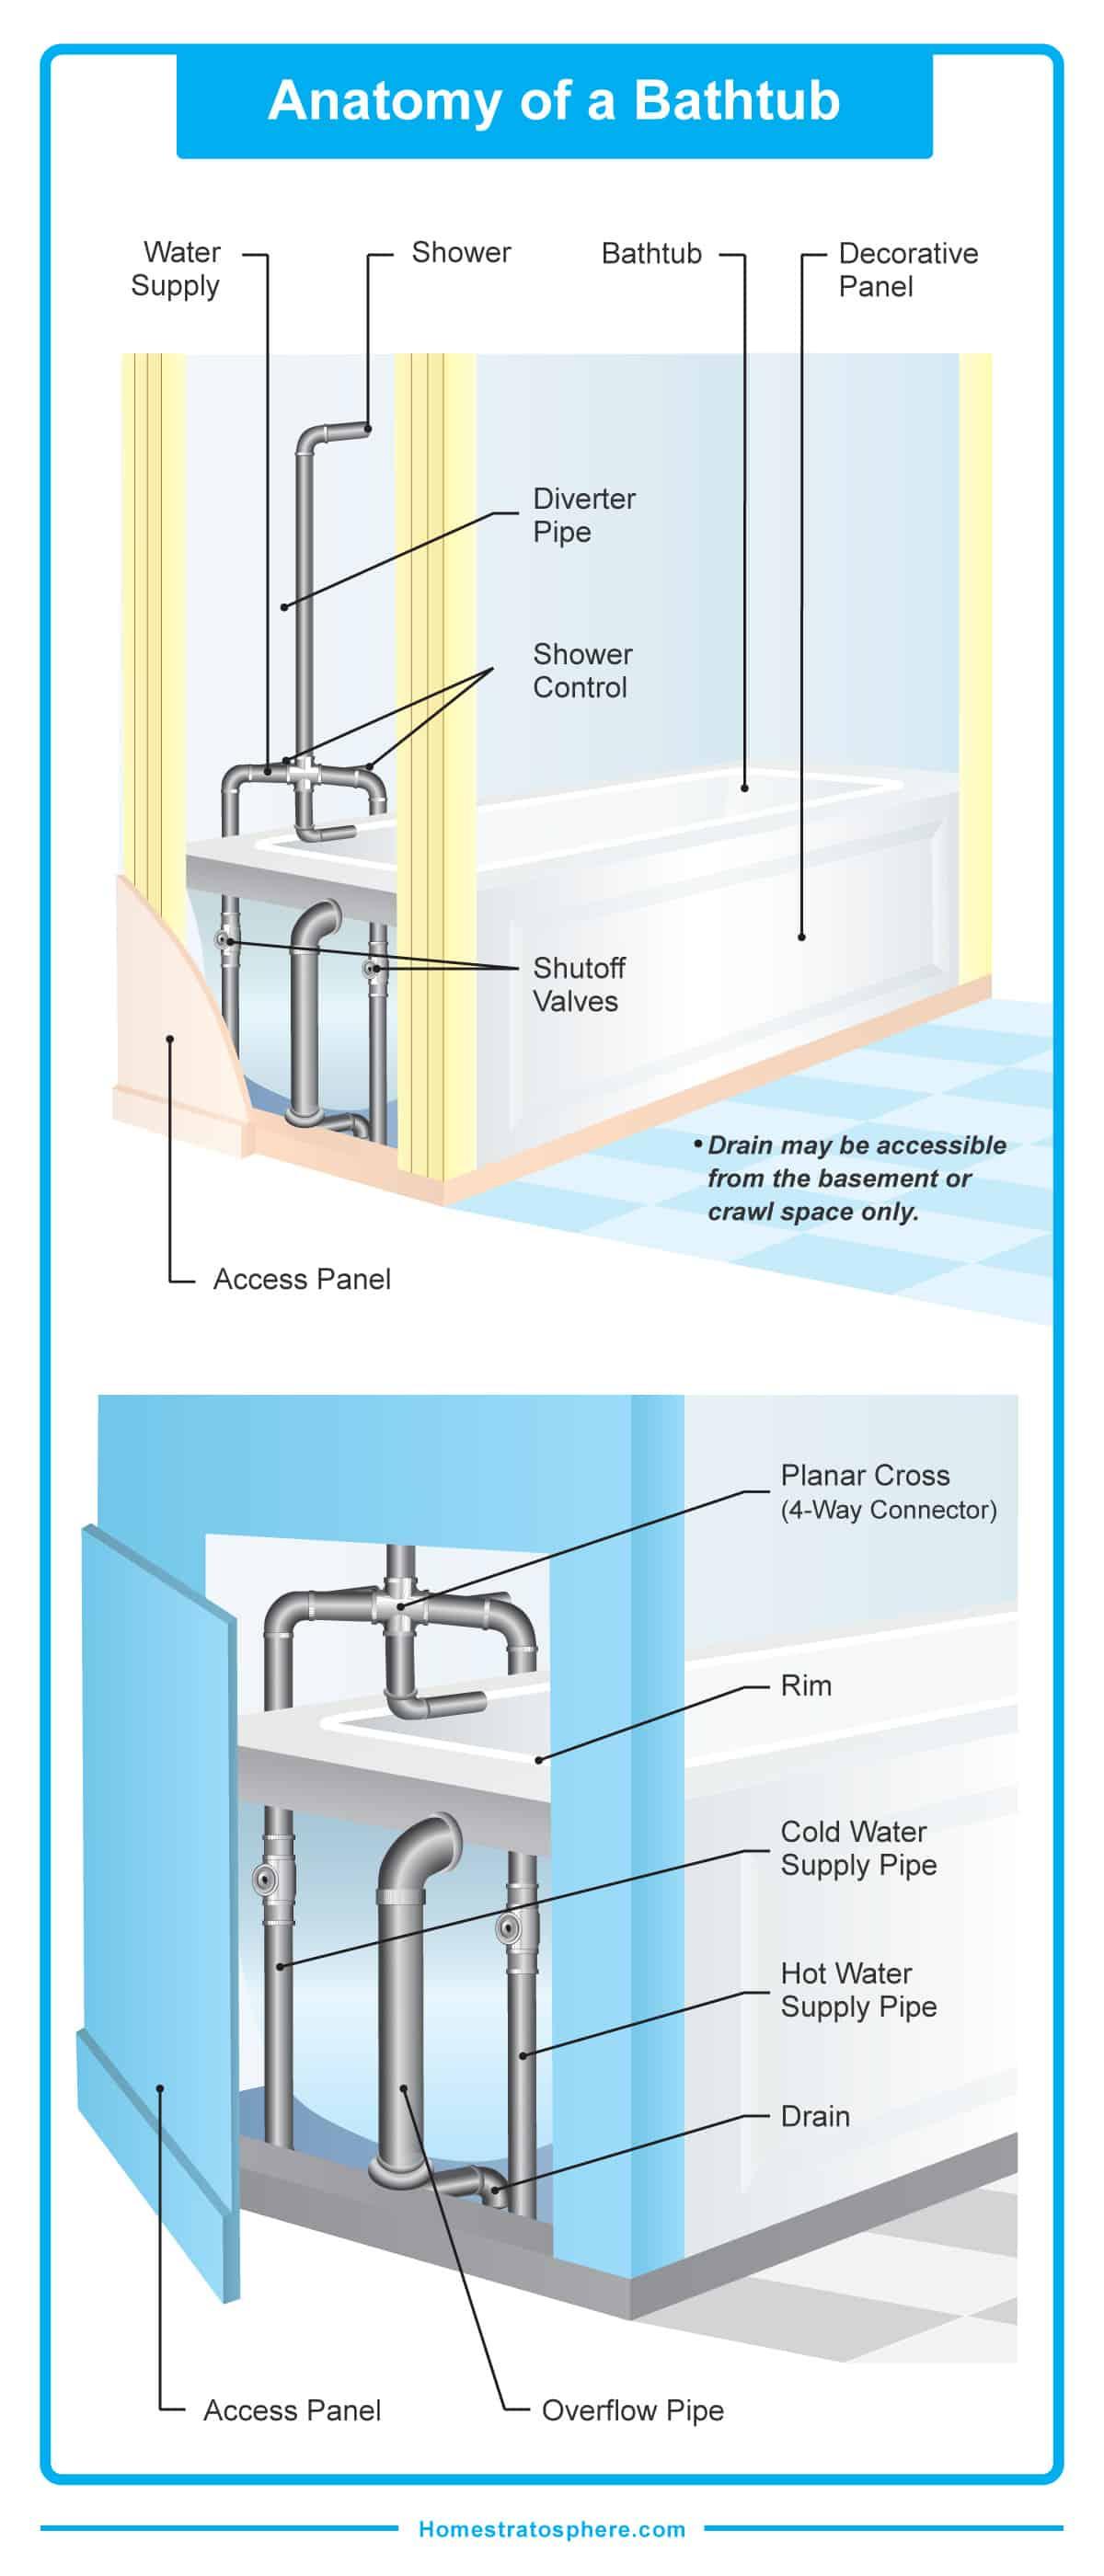 Cross section diagram of a bathtub